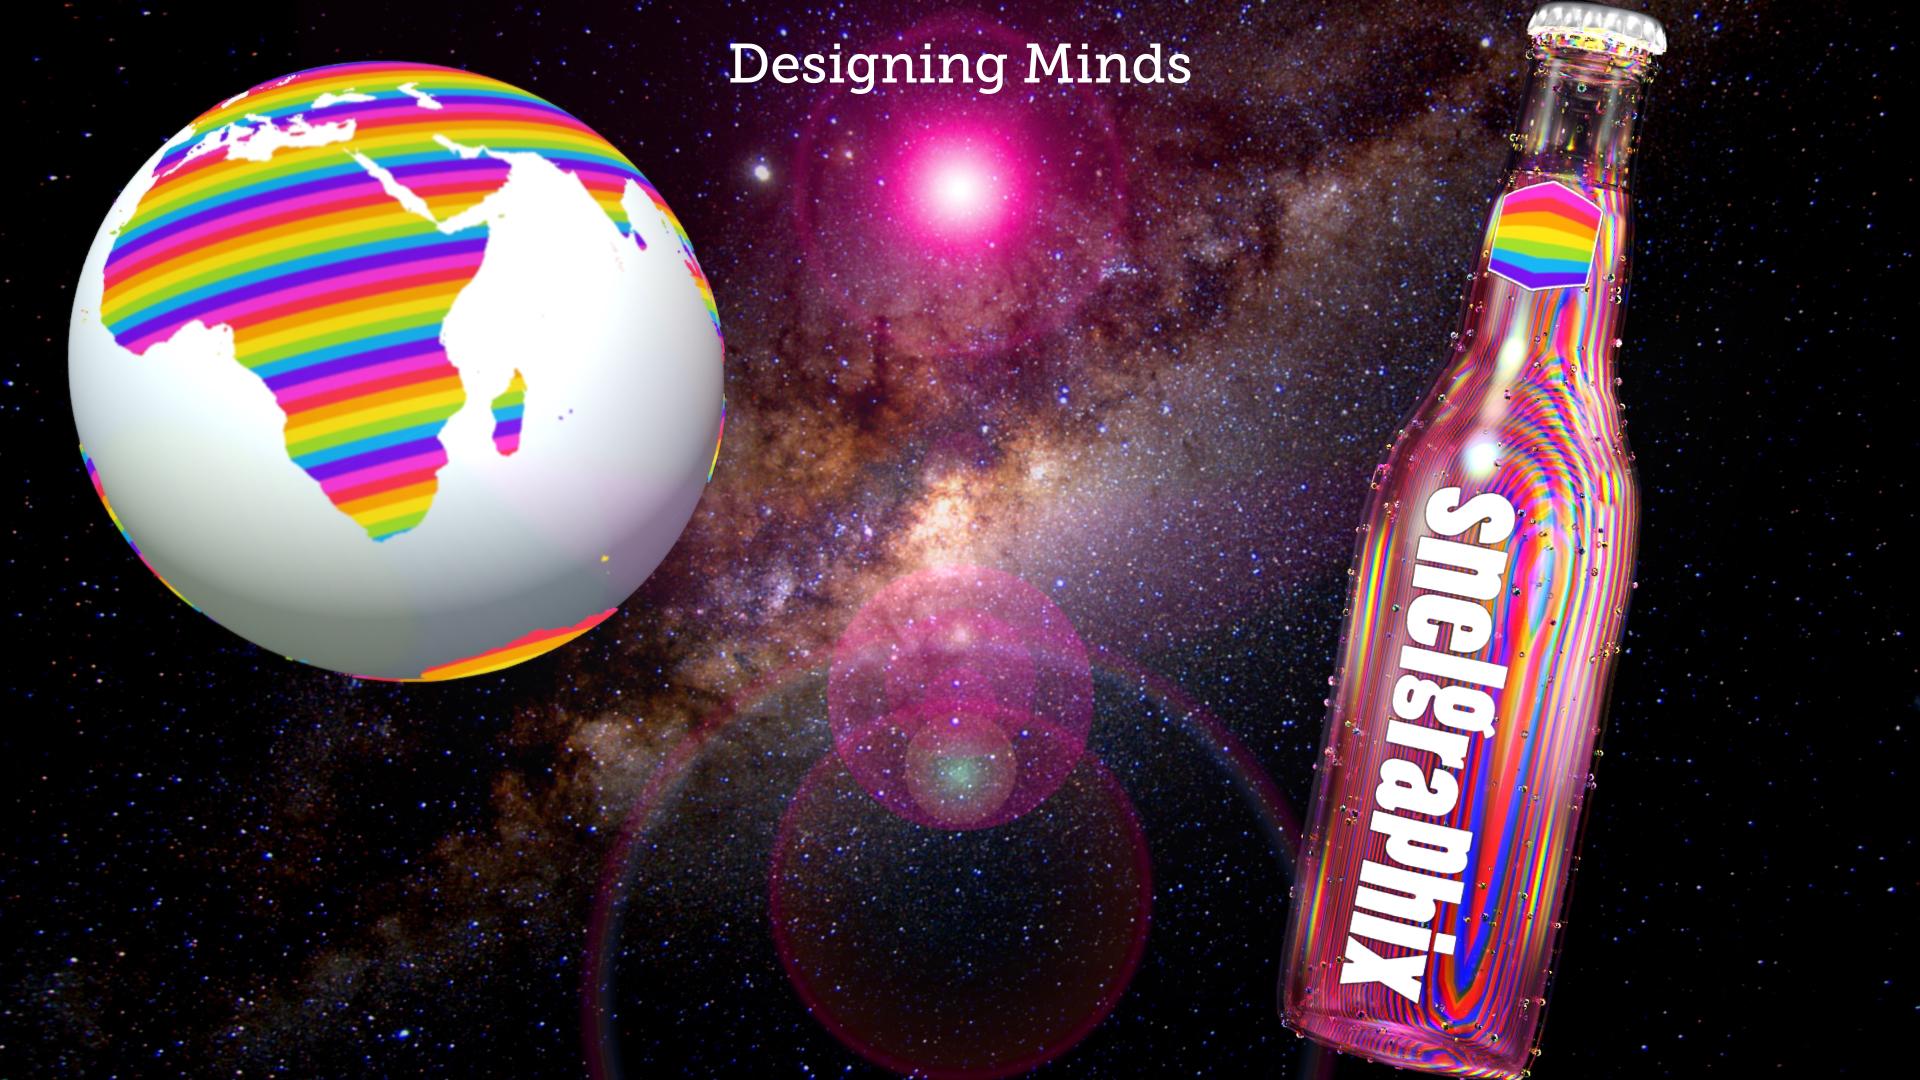 Snelgraphix Communication Design